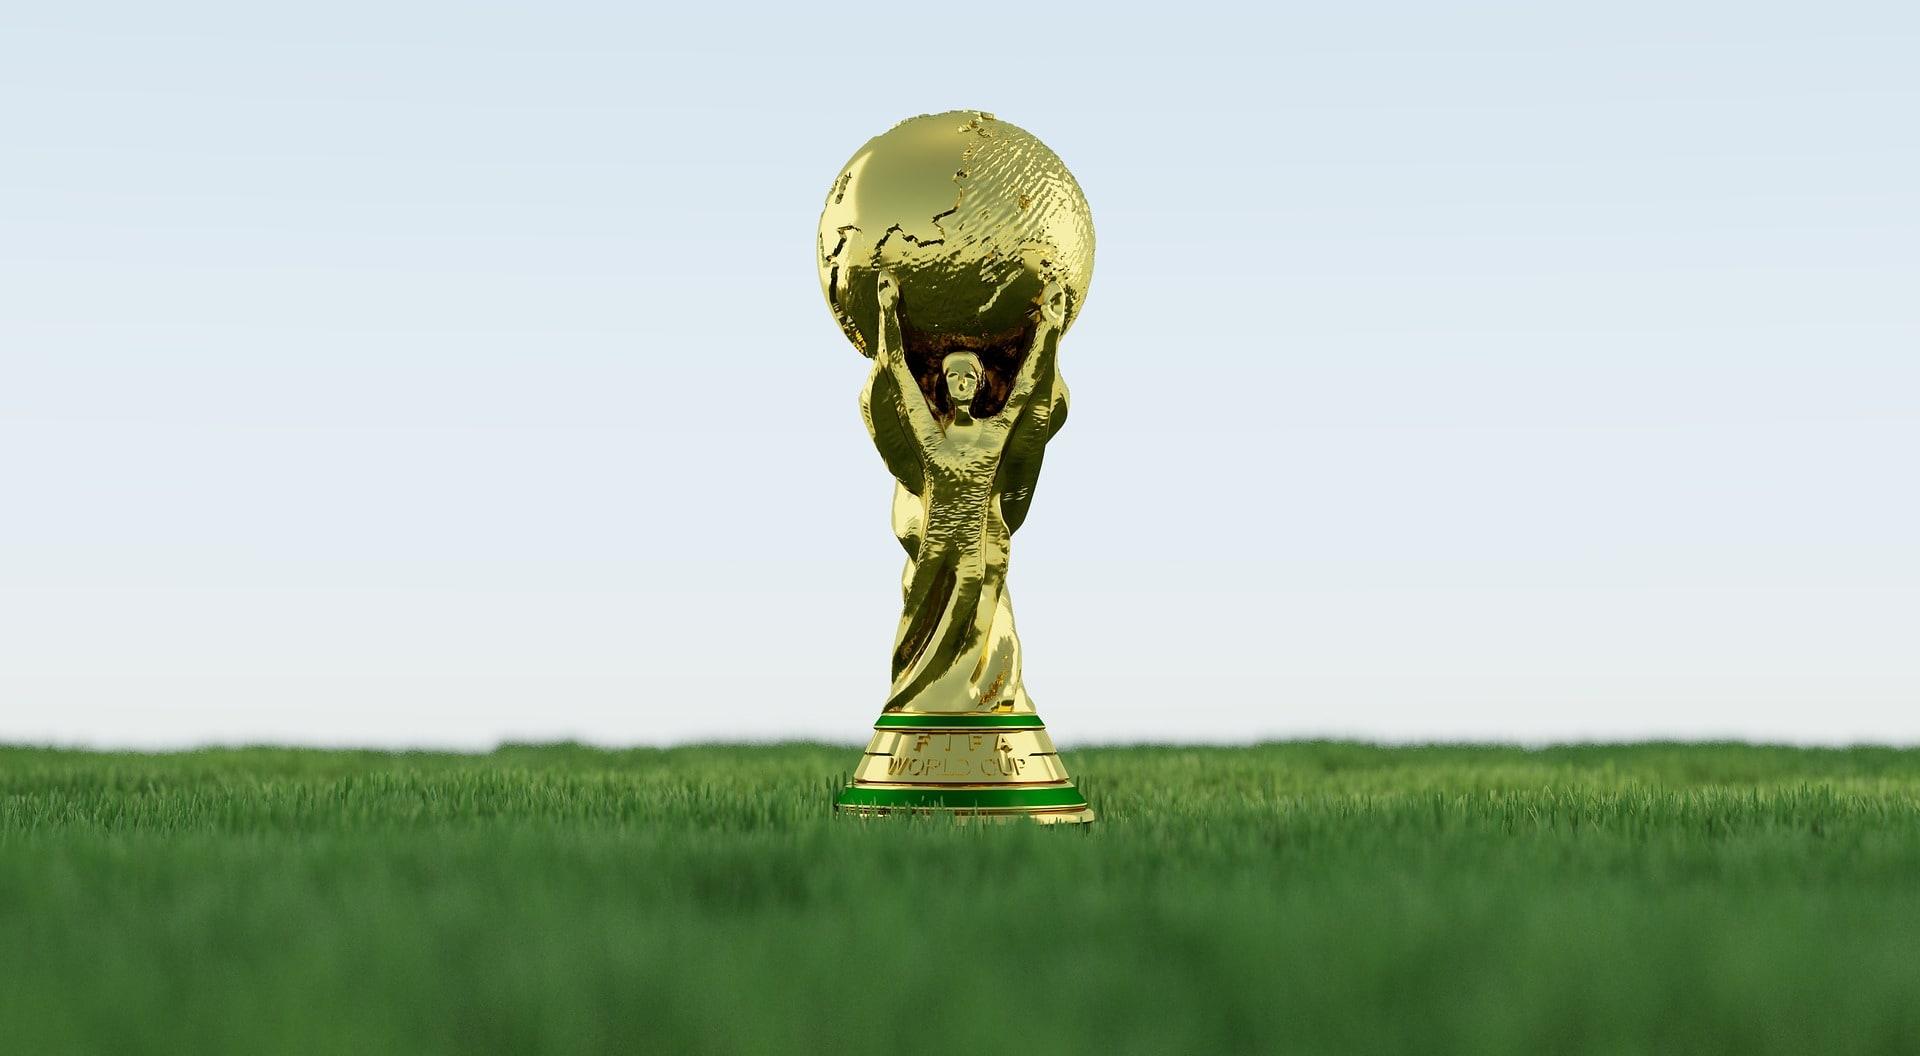 trophy 3460142 1920